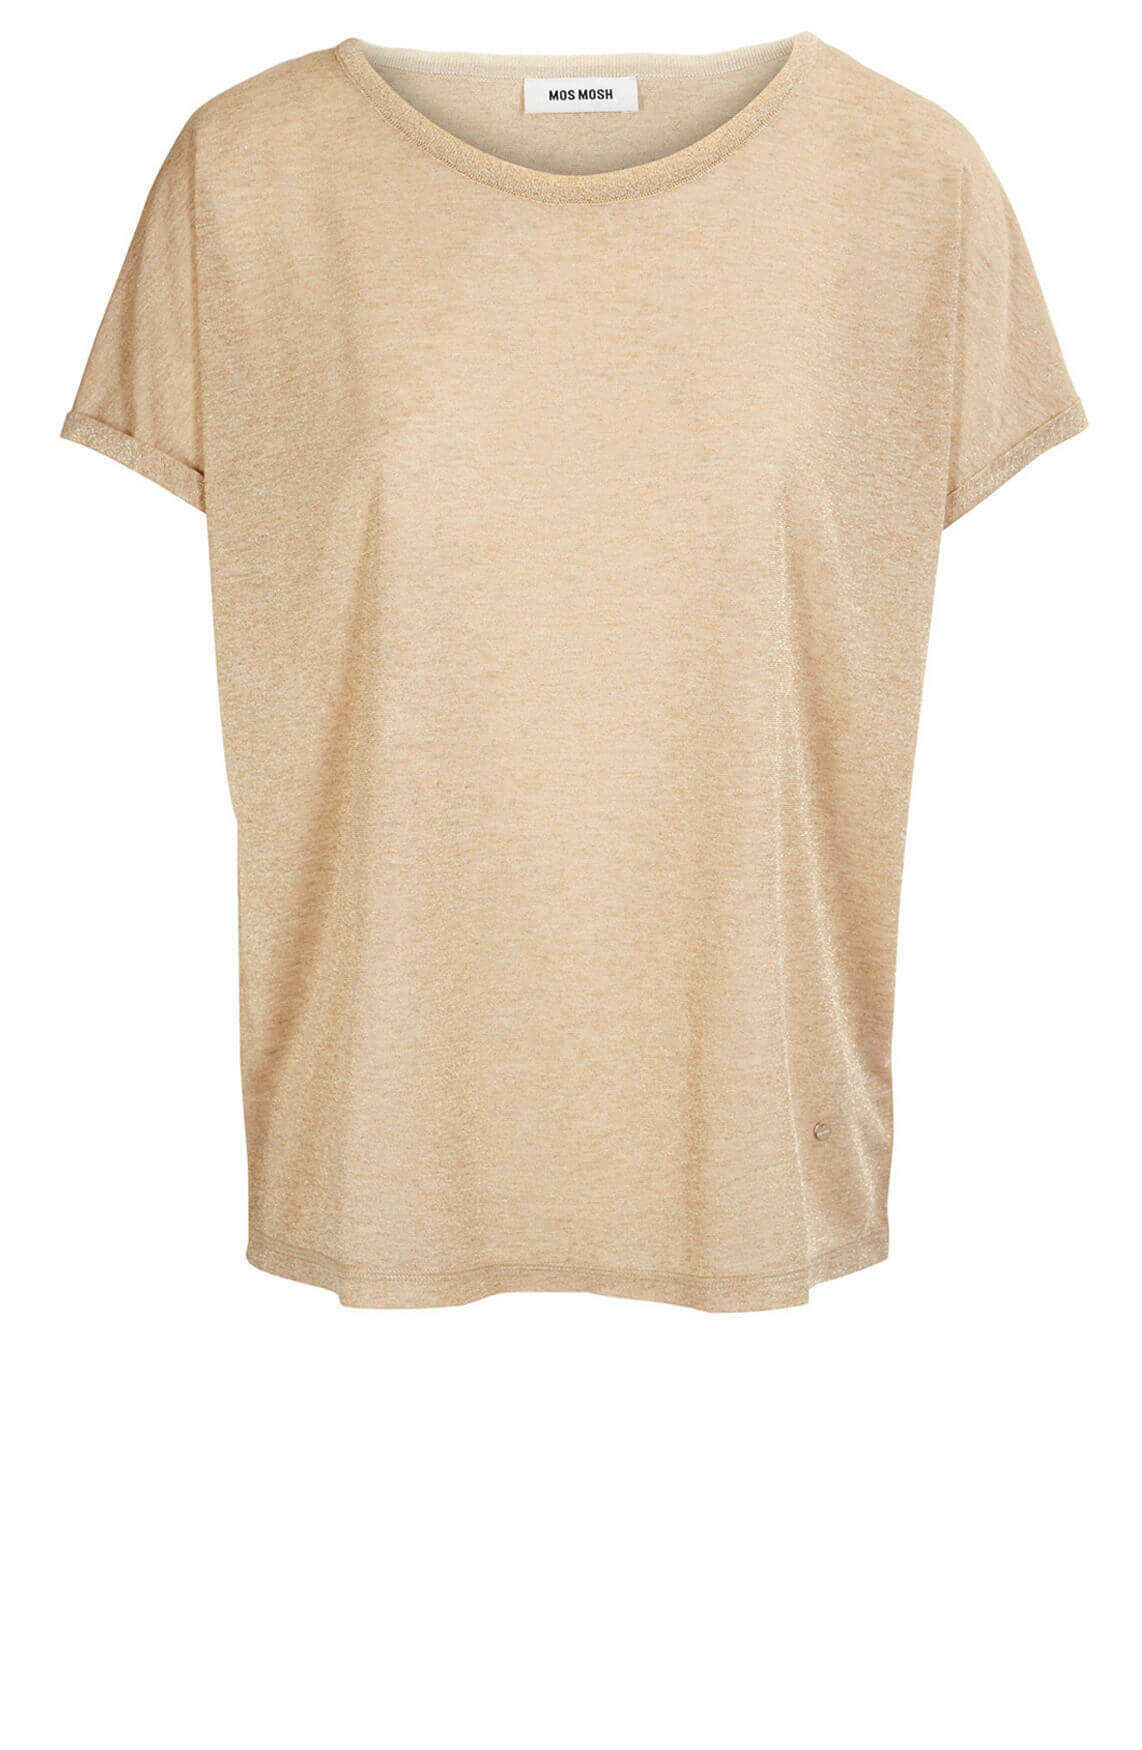 Mos Mosh Dames Kay shirt goud